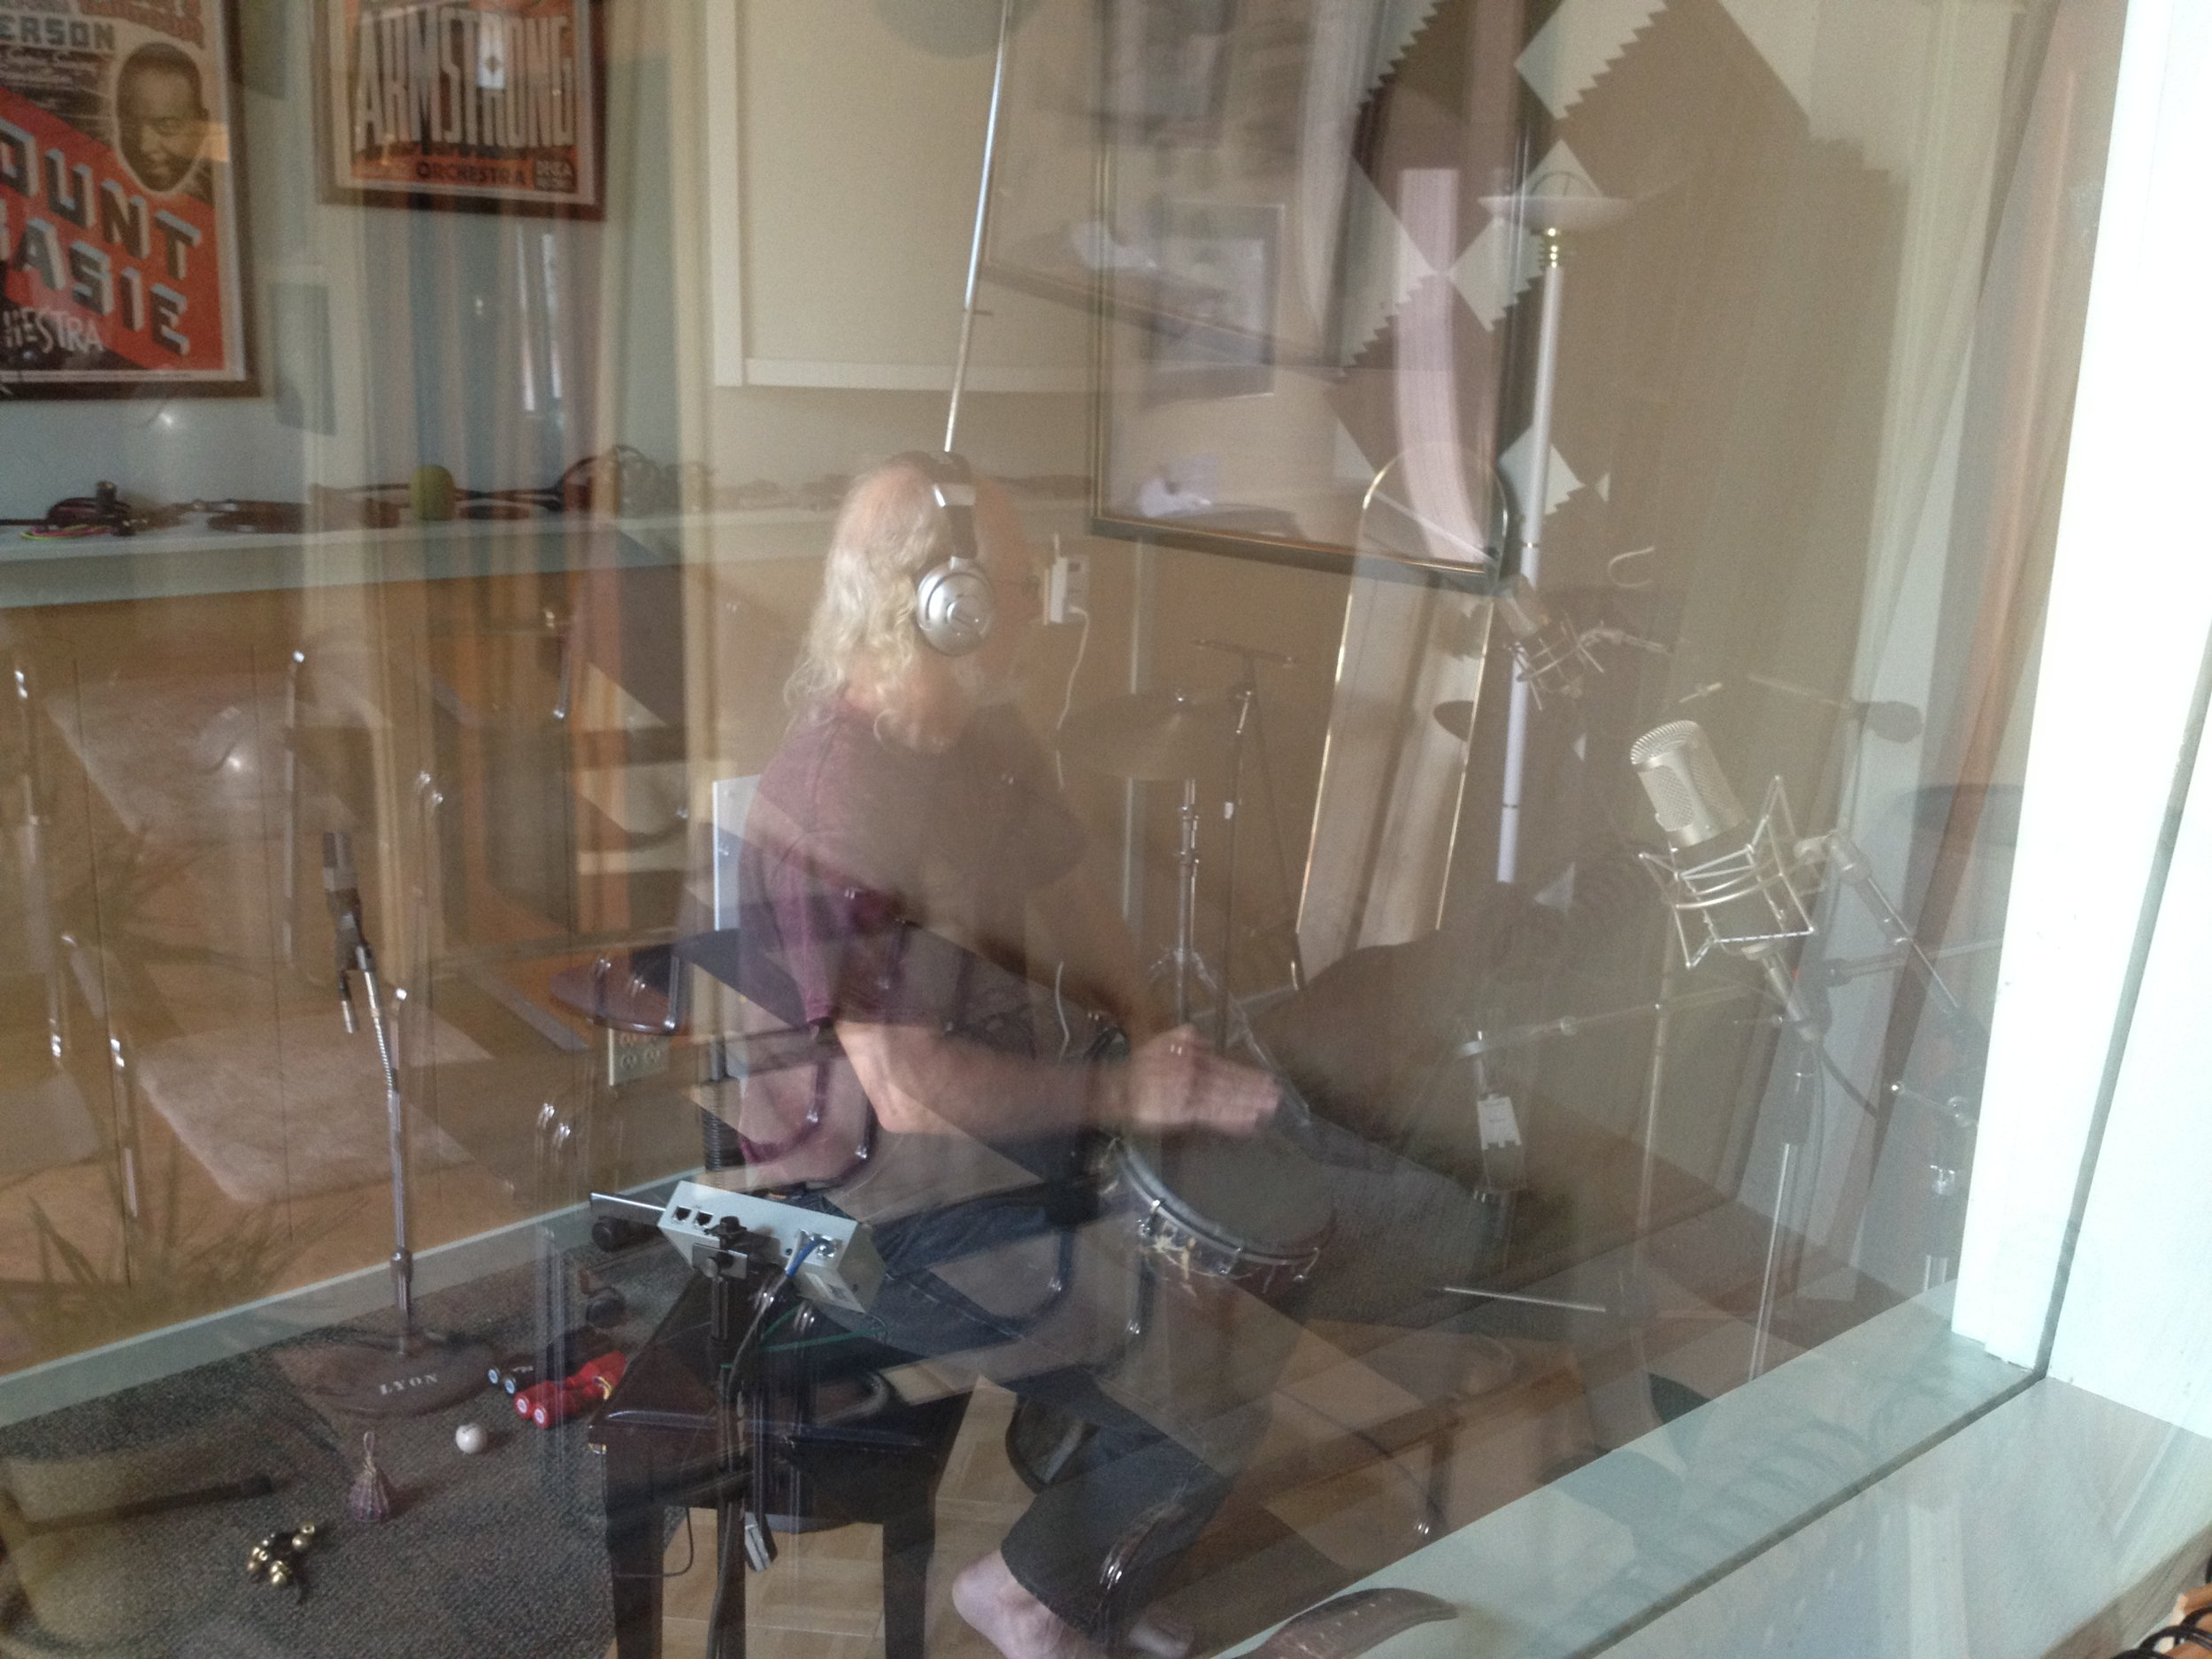 Ian on Doumbek at the Banquet Sound Studios